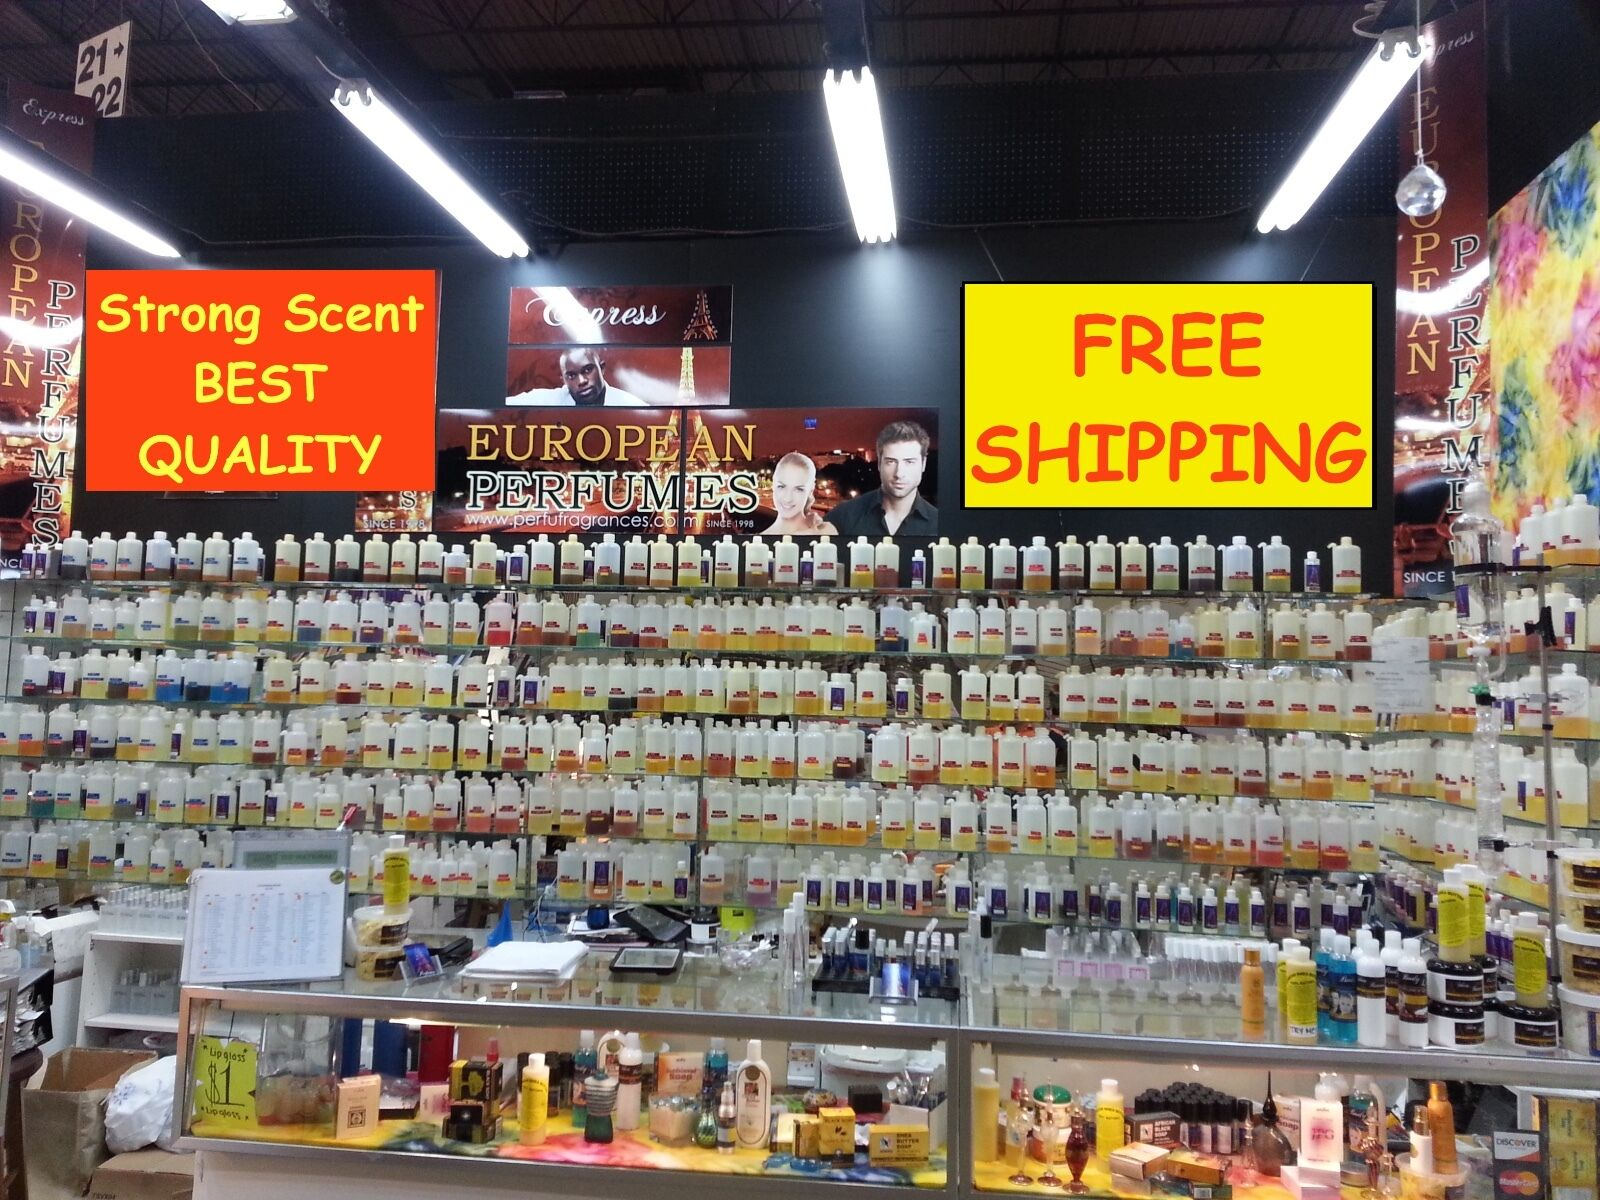 Buy Cologne / Perfume Perfumes